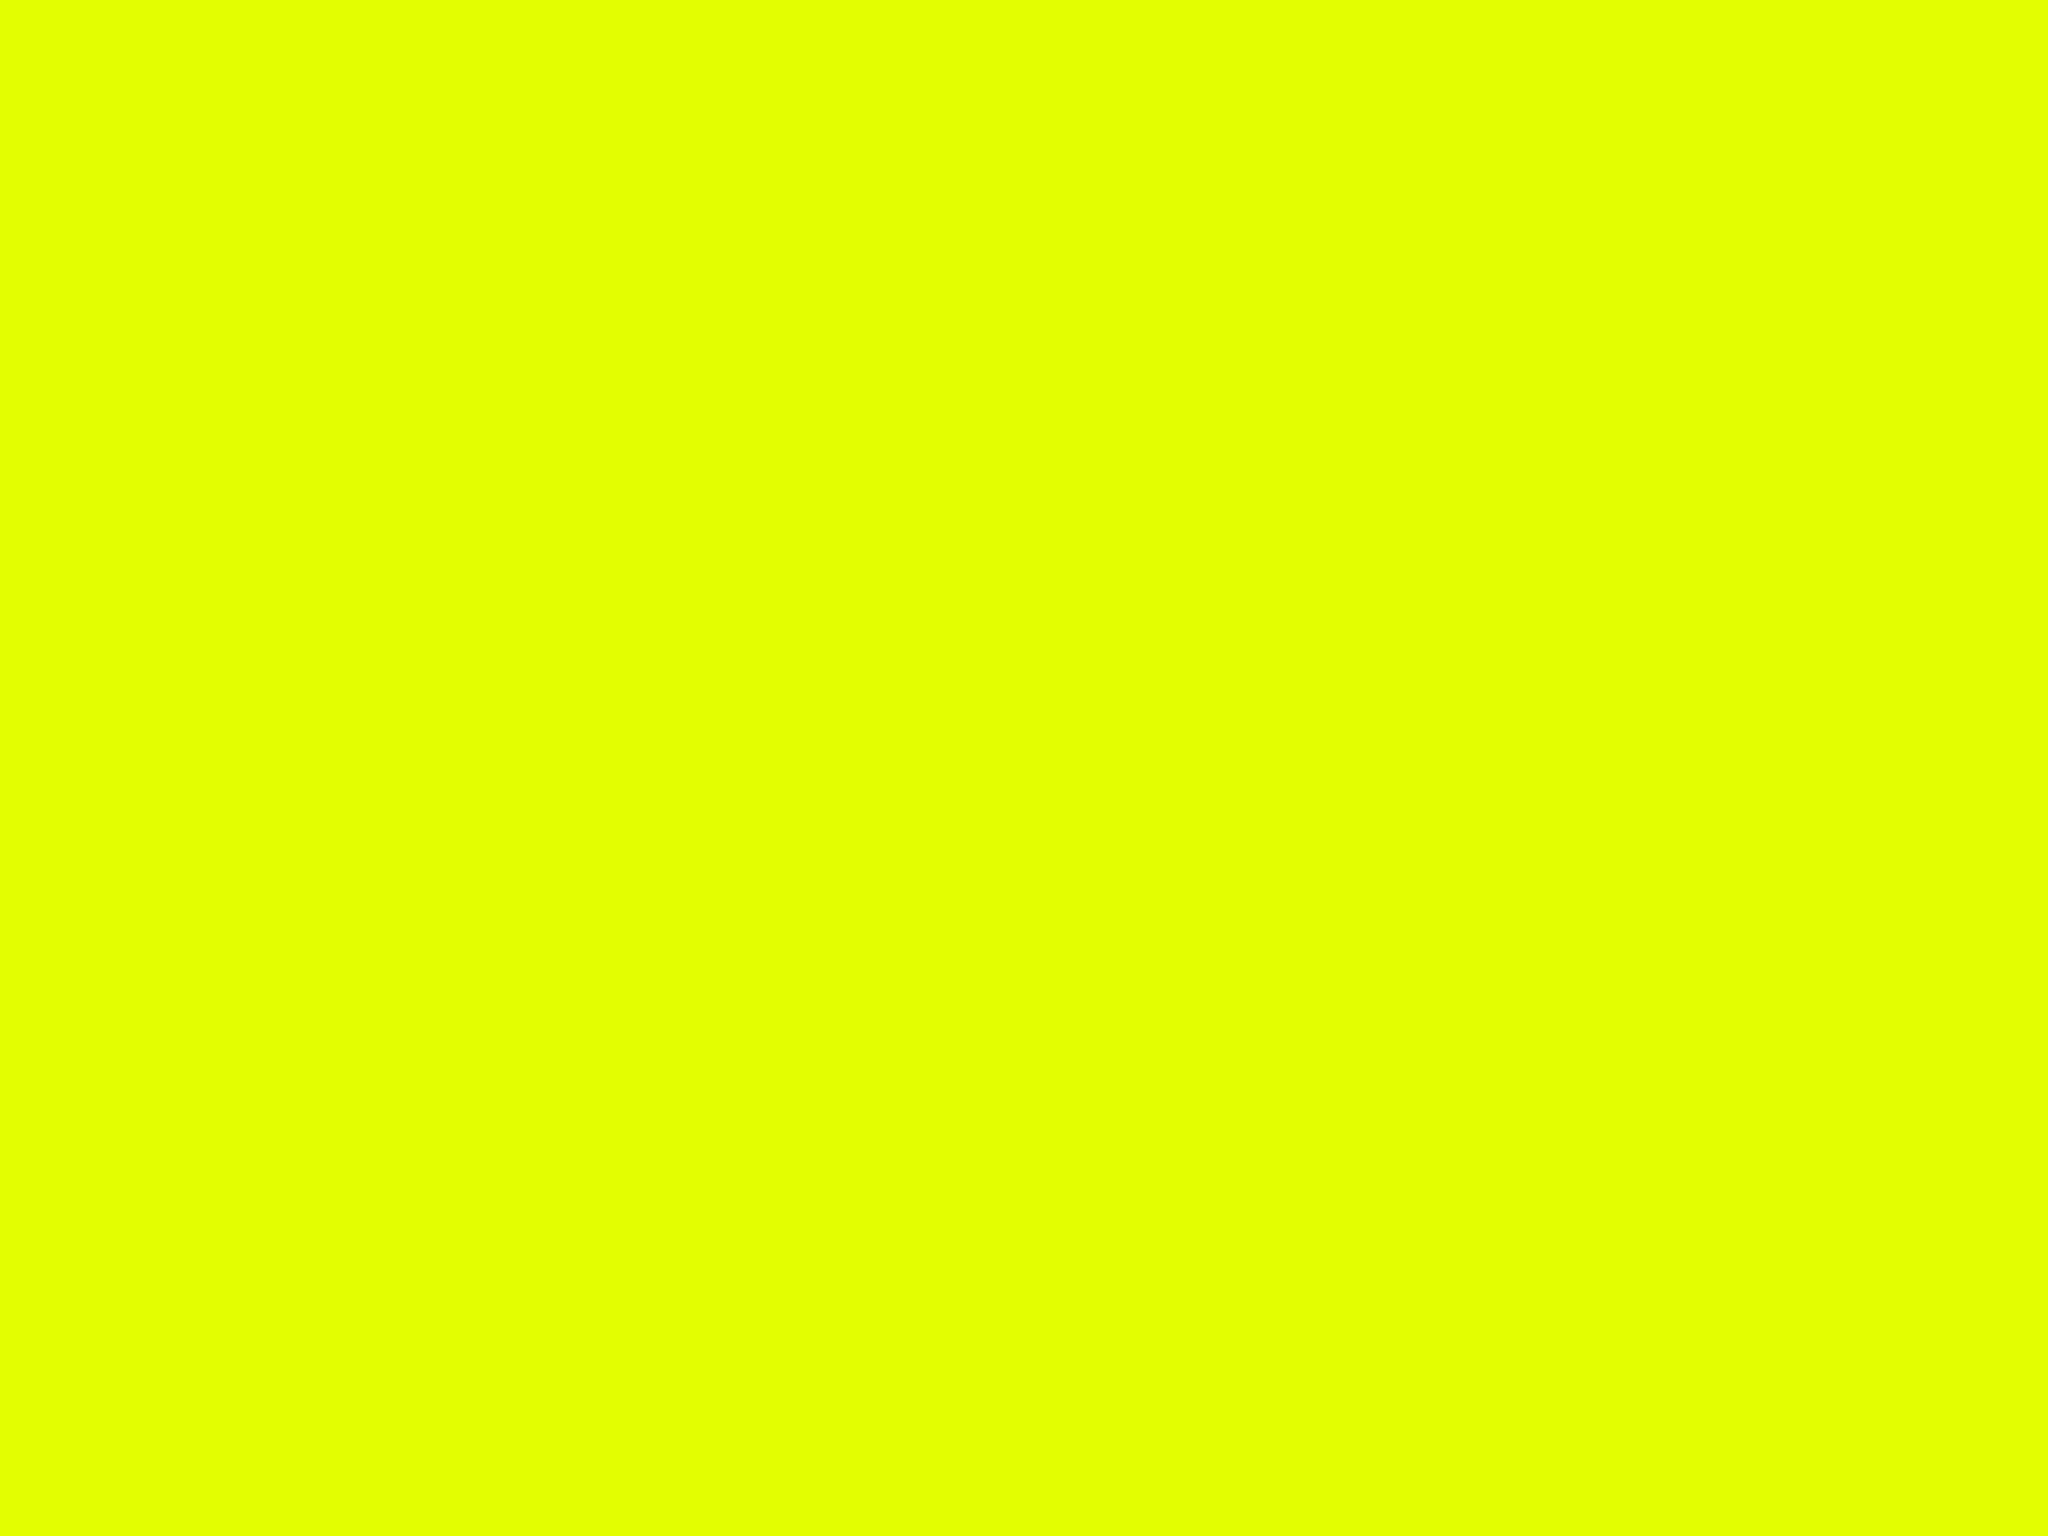 2048x1536 Lemon Lime Solid Color Background